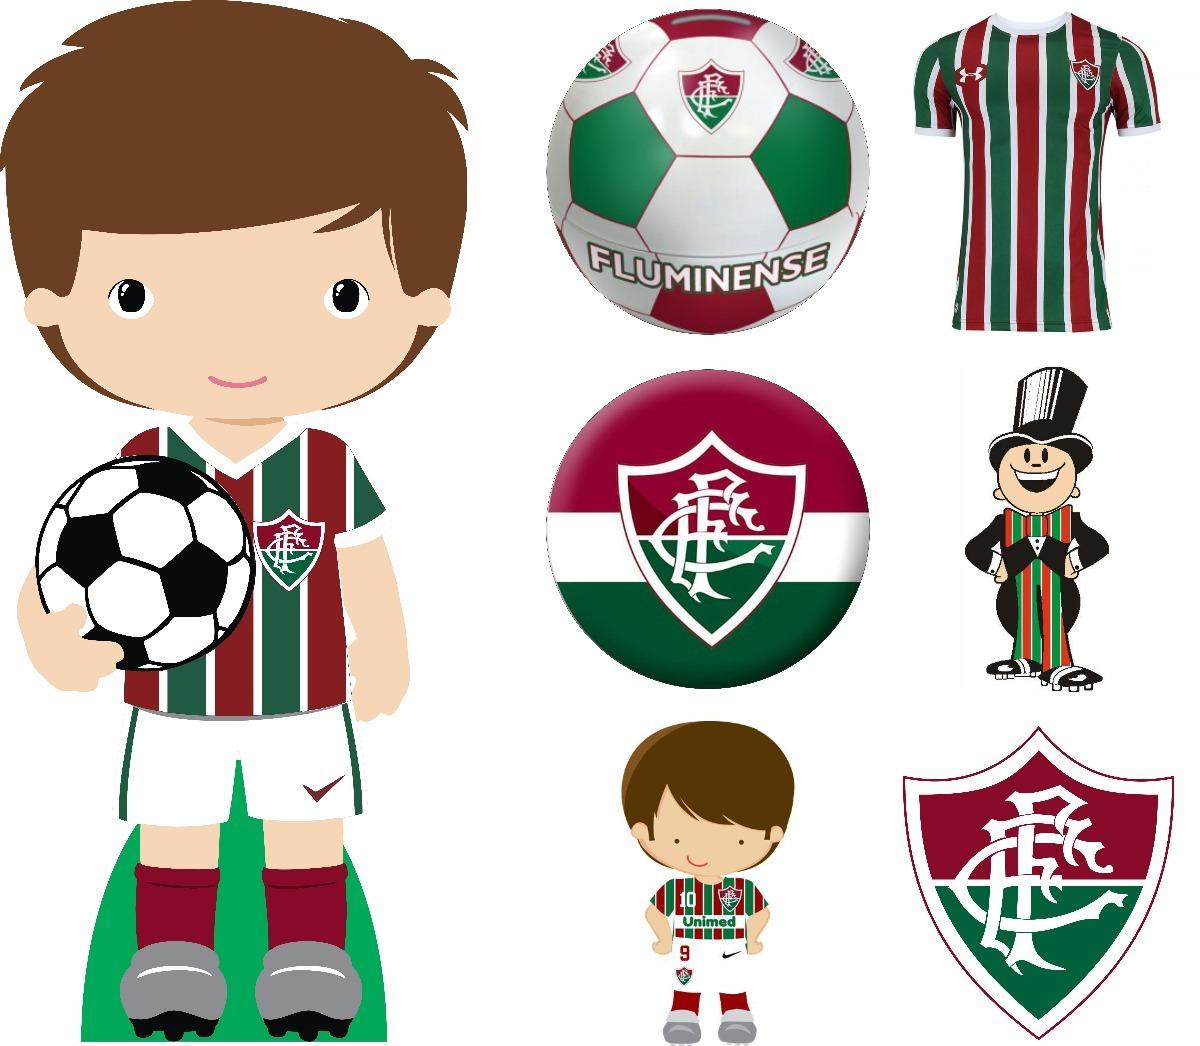 Kit 7 Pçs Display Chão E Mesa Festa Futebol Fluminense Cute - R  74 ... 0e42be42f517e